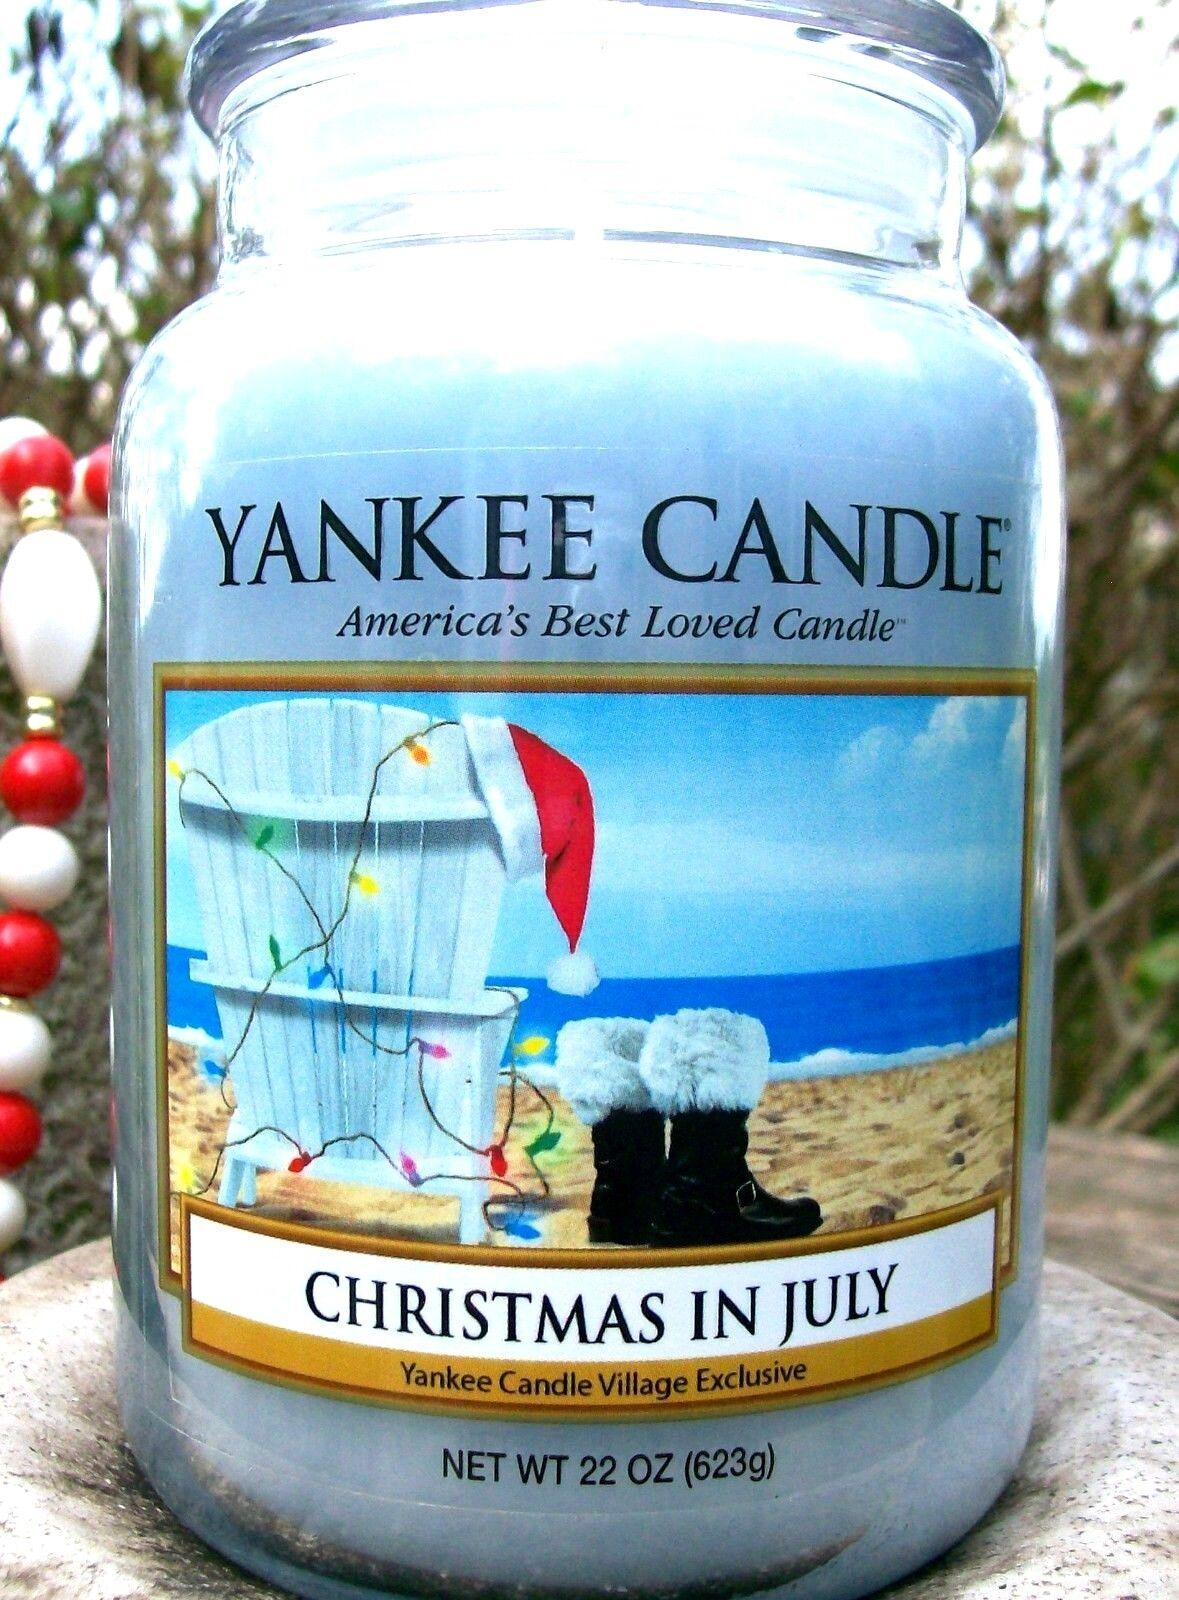 Yankee Candle  CHRISTMAS IN JULY  DEERFIELD VILLAGE EXCLUSIVE  22 oz. RAREVHTF